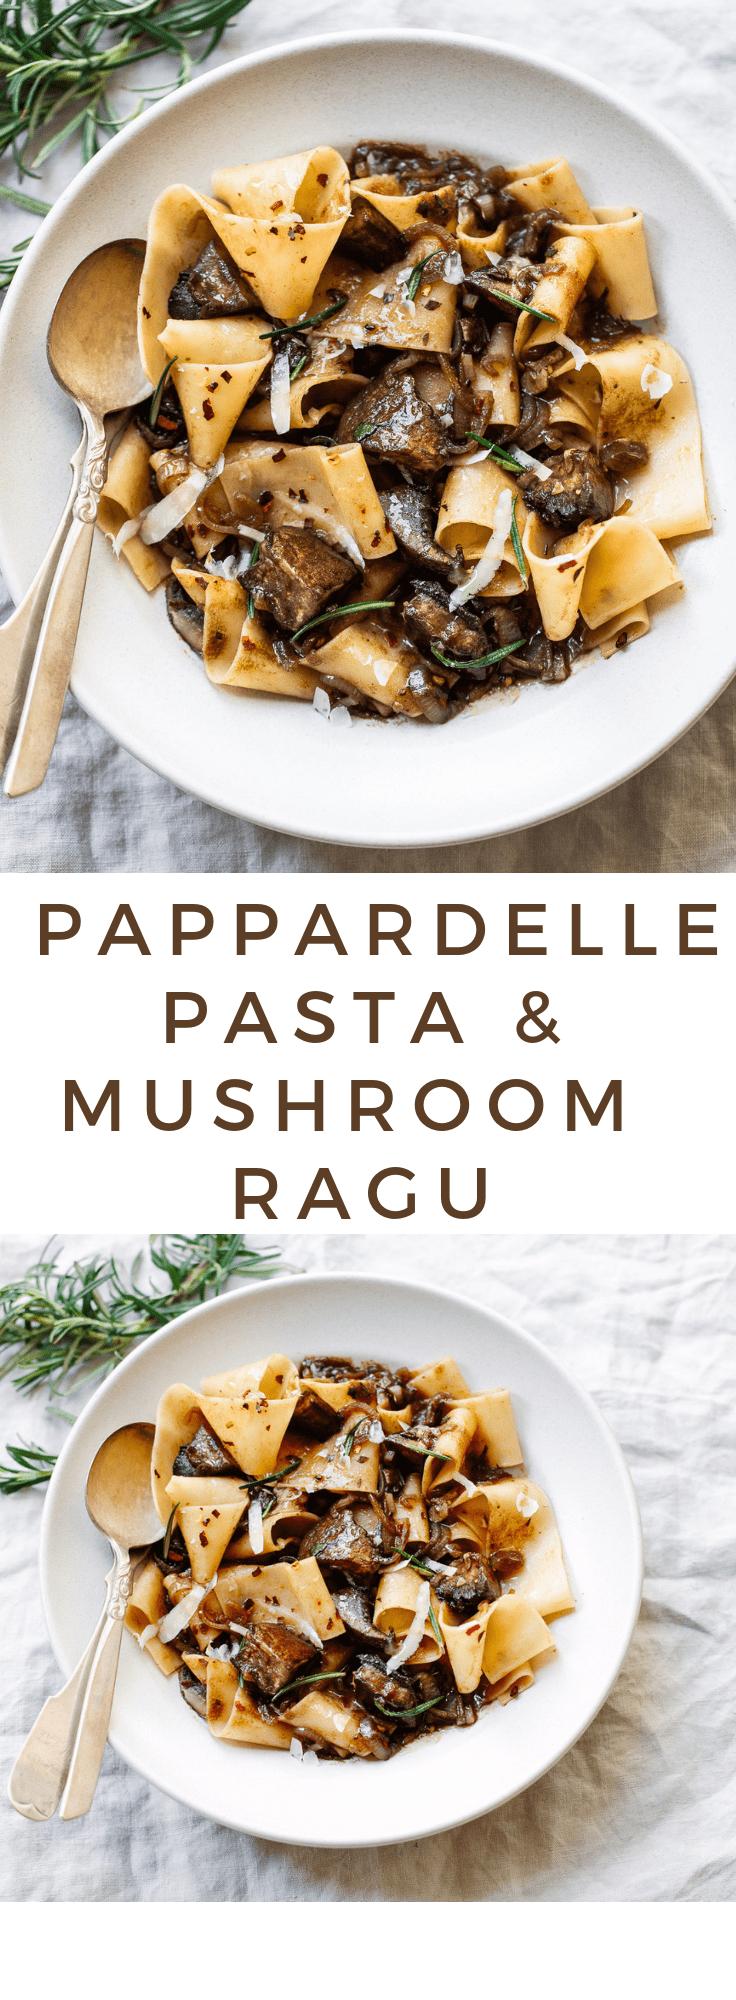 Photo of Pappardelle Pasta with Portobello Mushroom Ragu